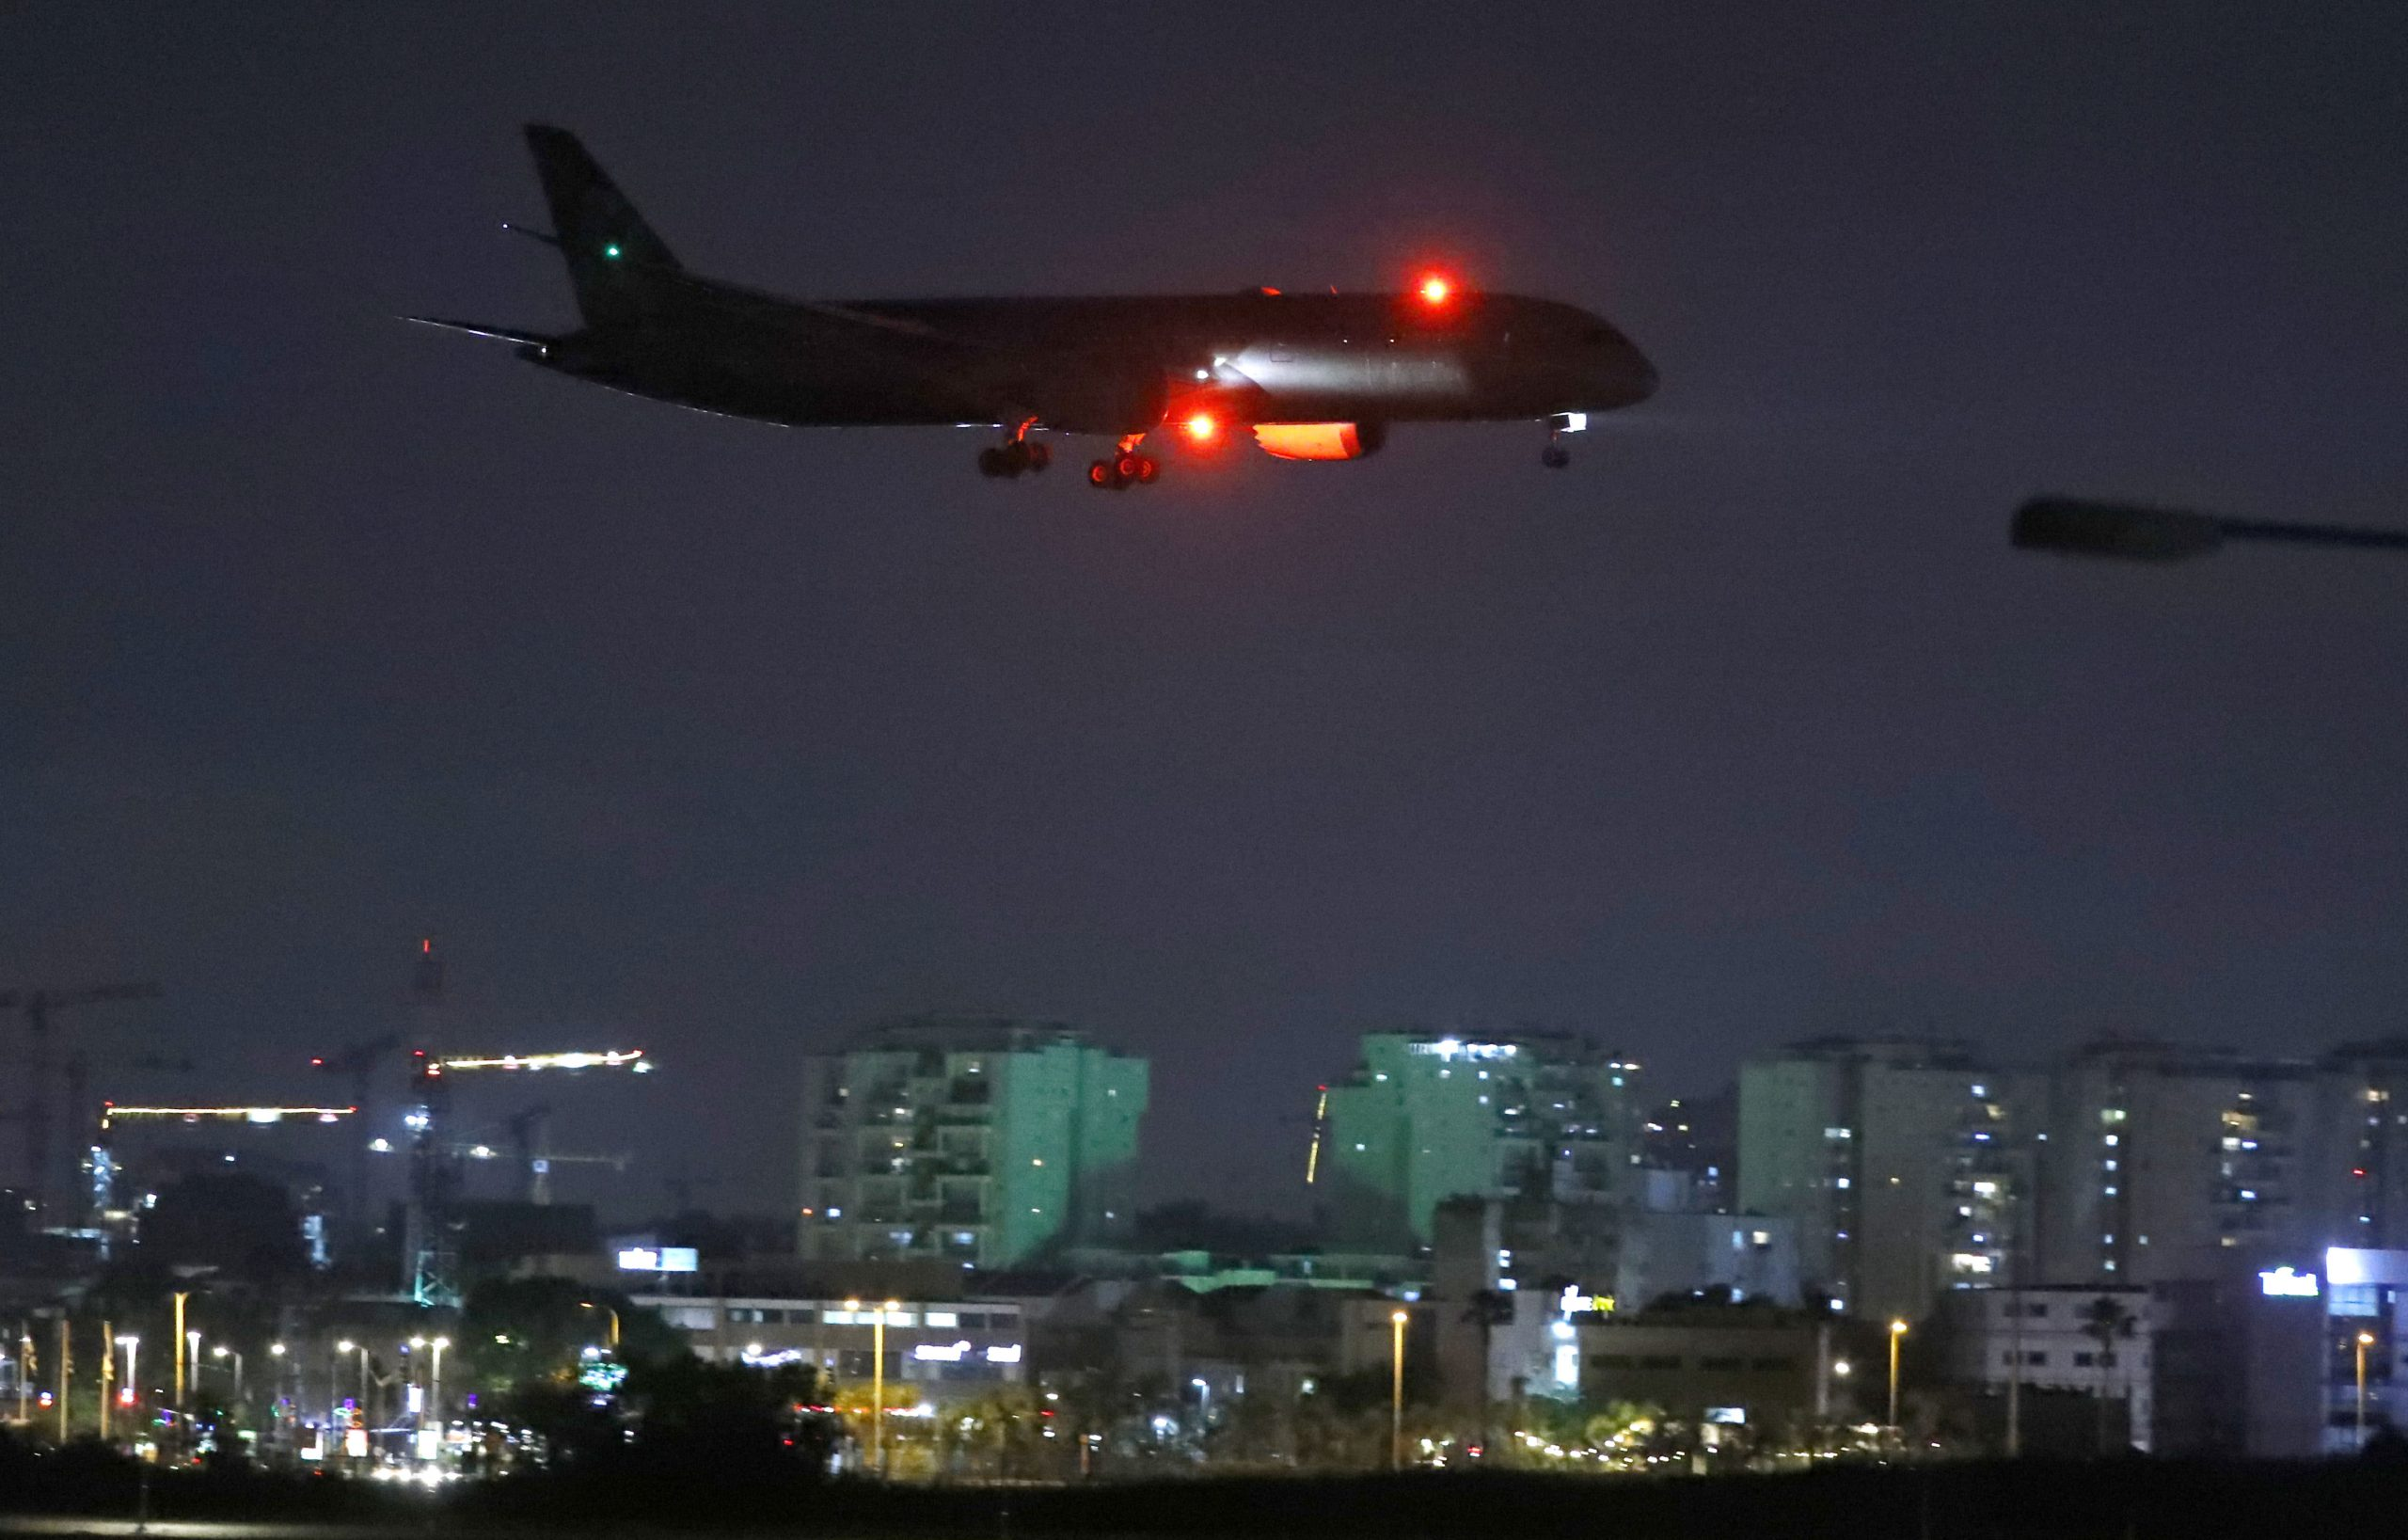 Emirates, Etihad faucet Israel for development as new enterprise ties deepen